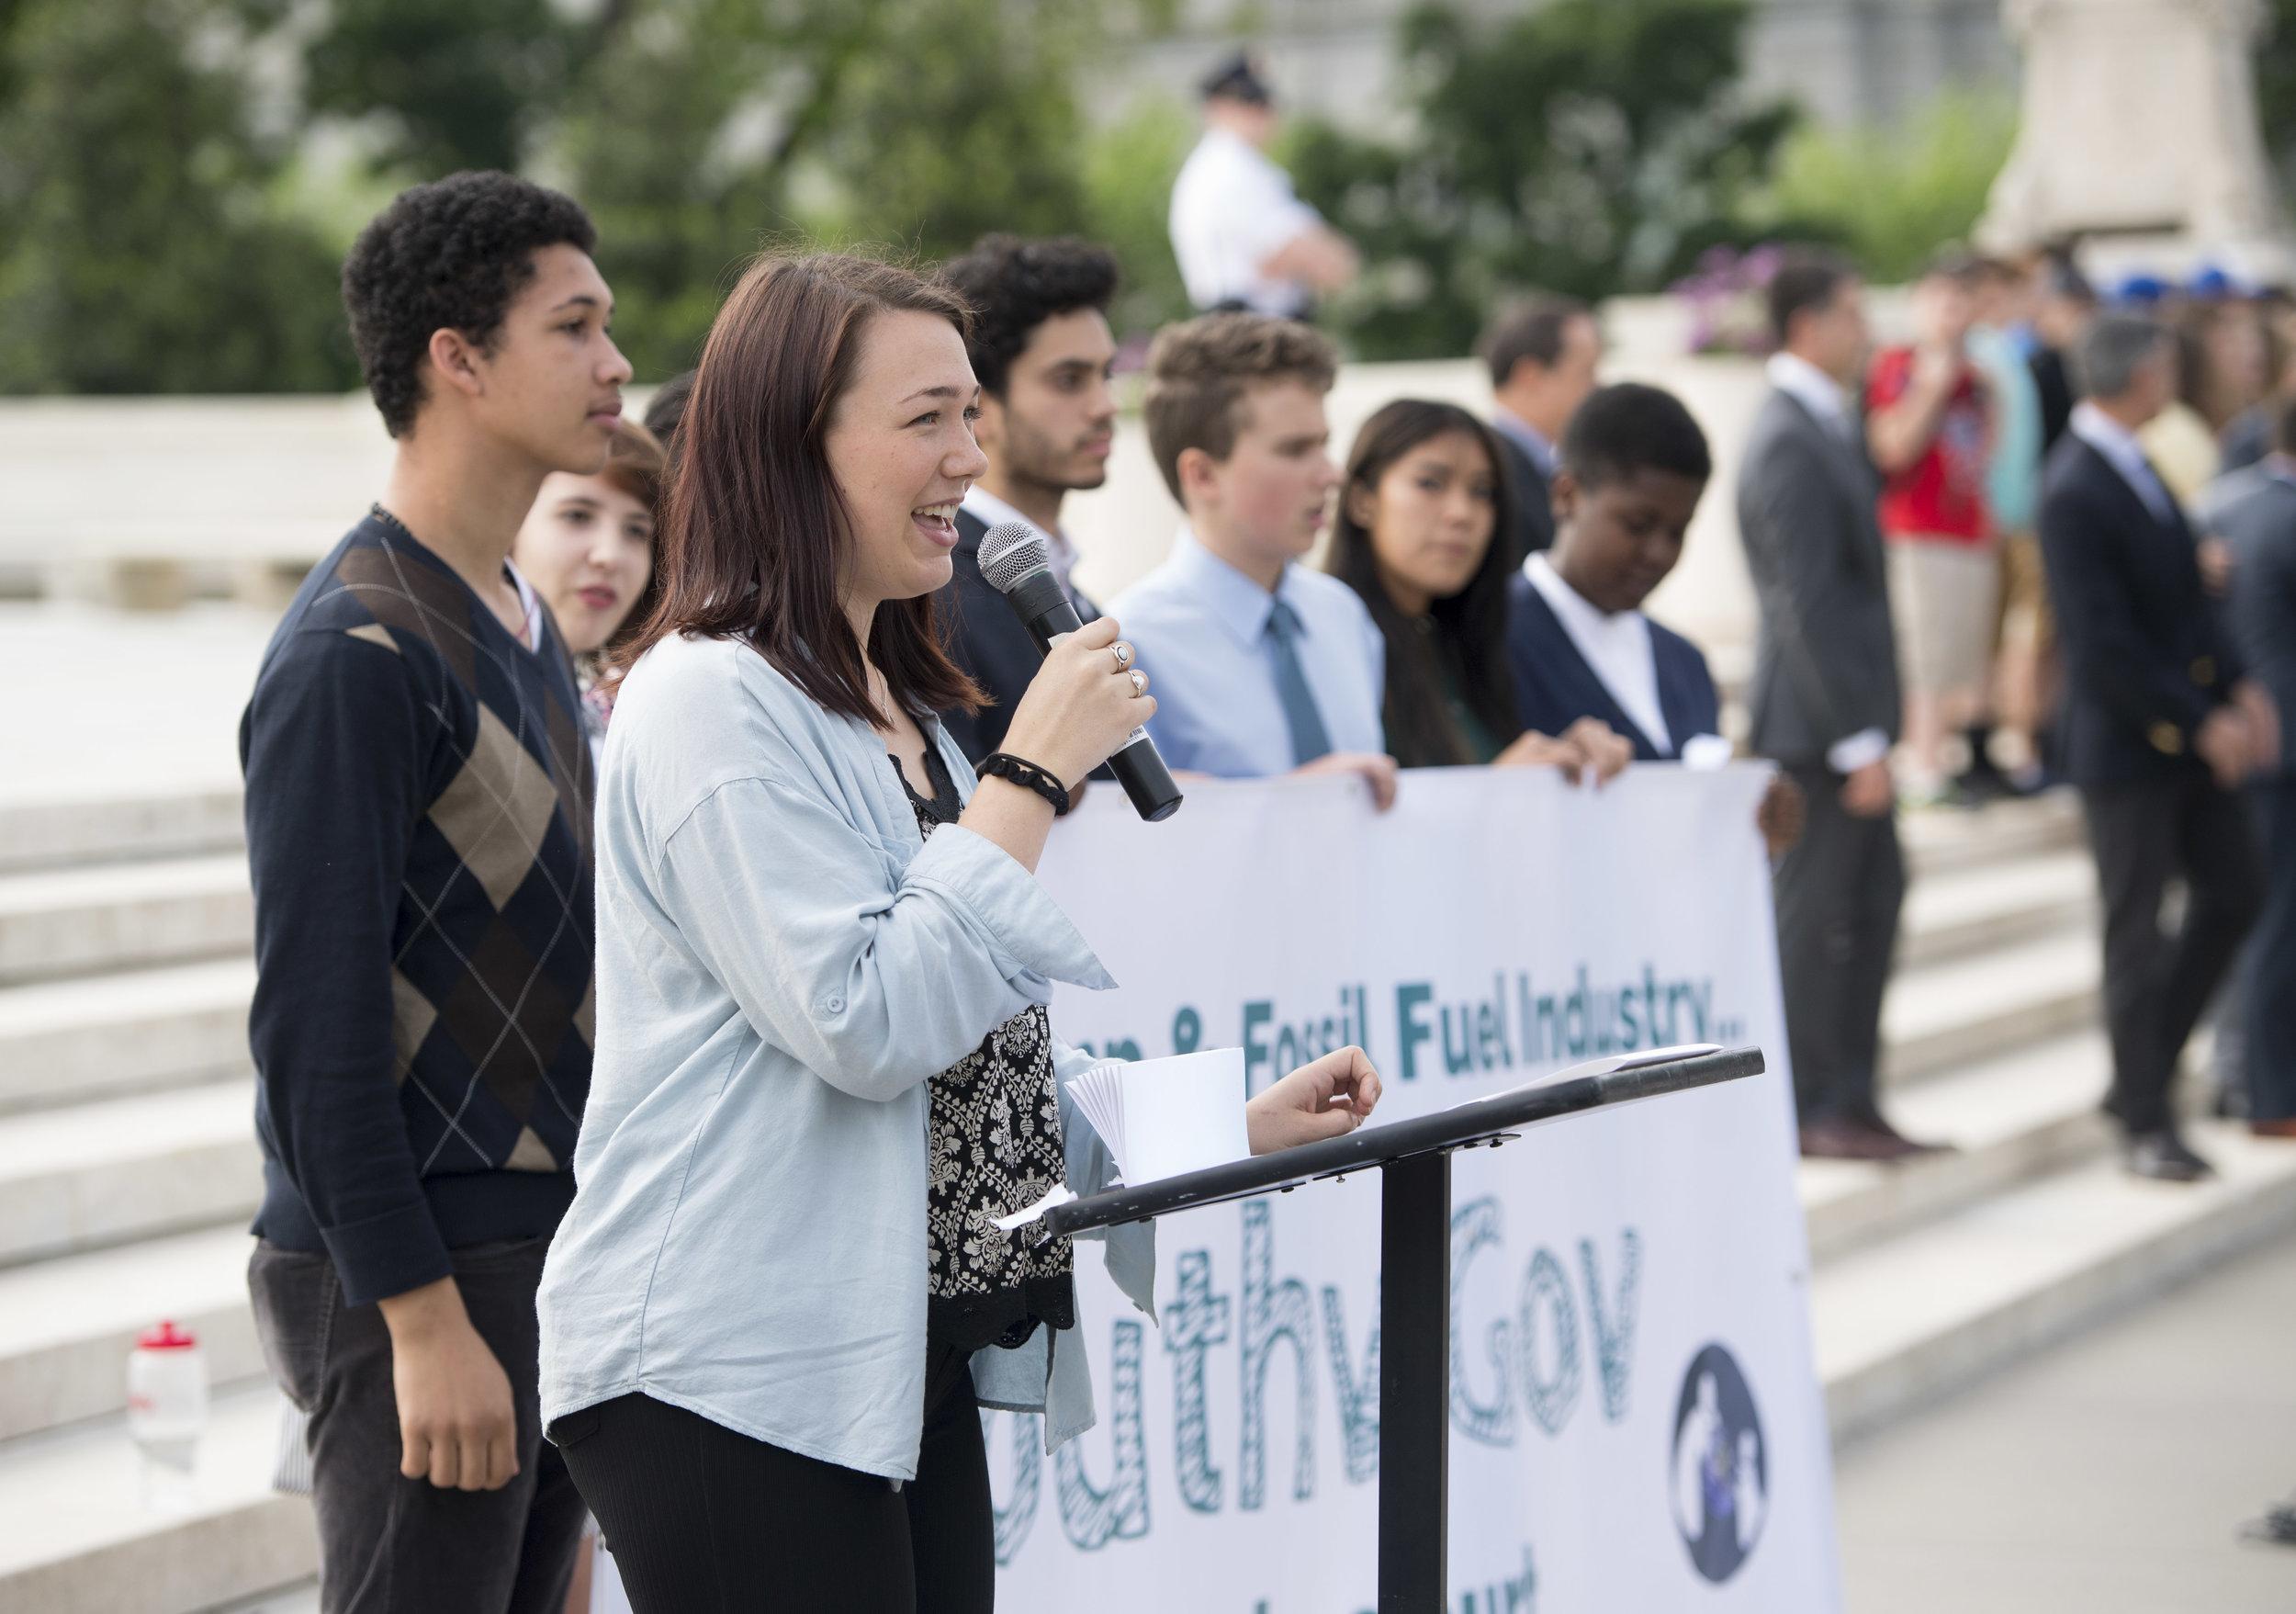 Kelsey speaks outside the US Supreme Court, April 27, 2017. Photo: Robin Loznak